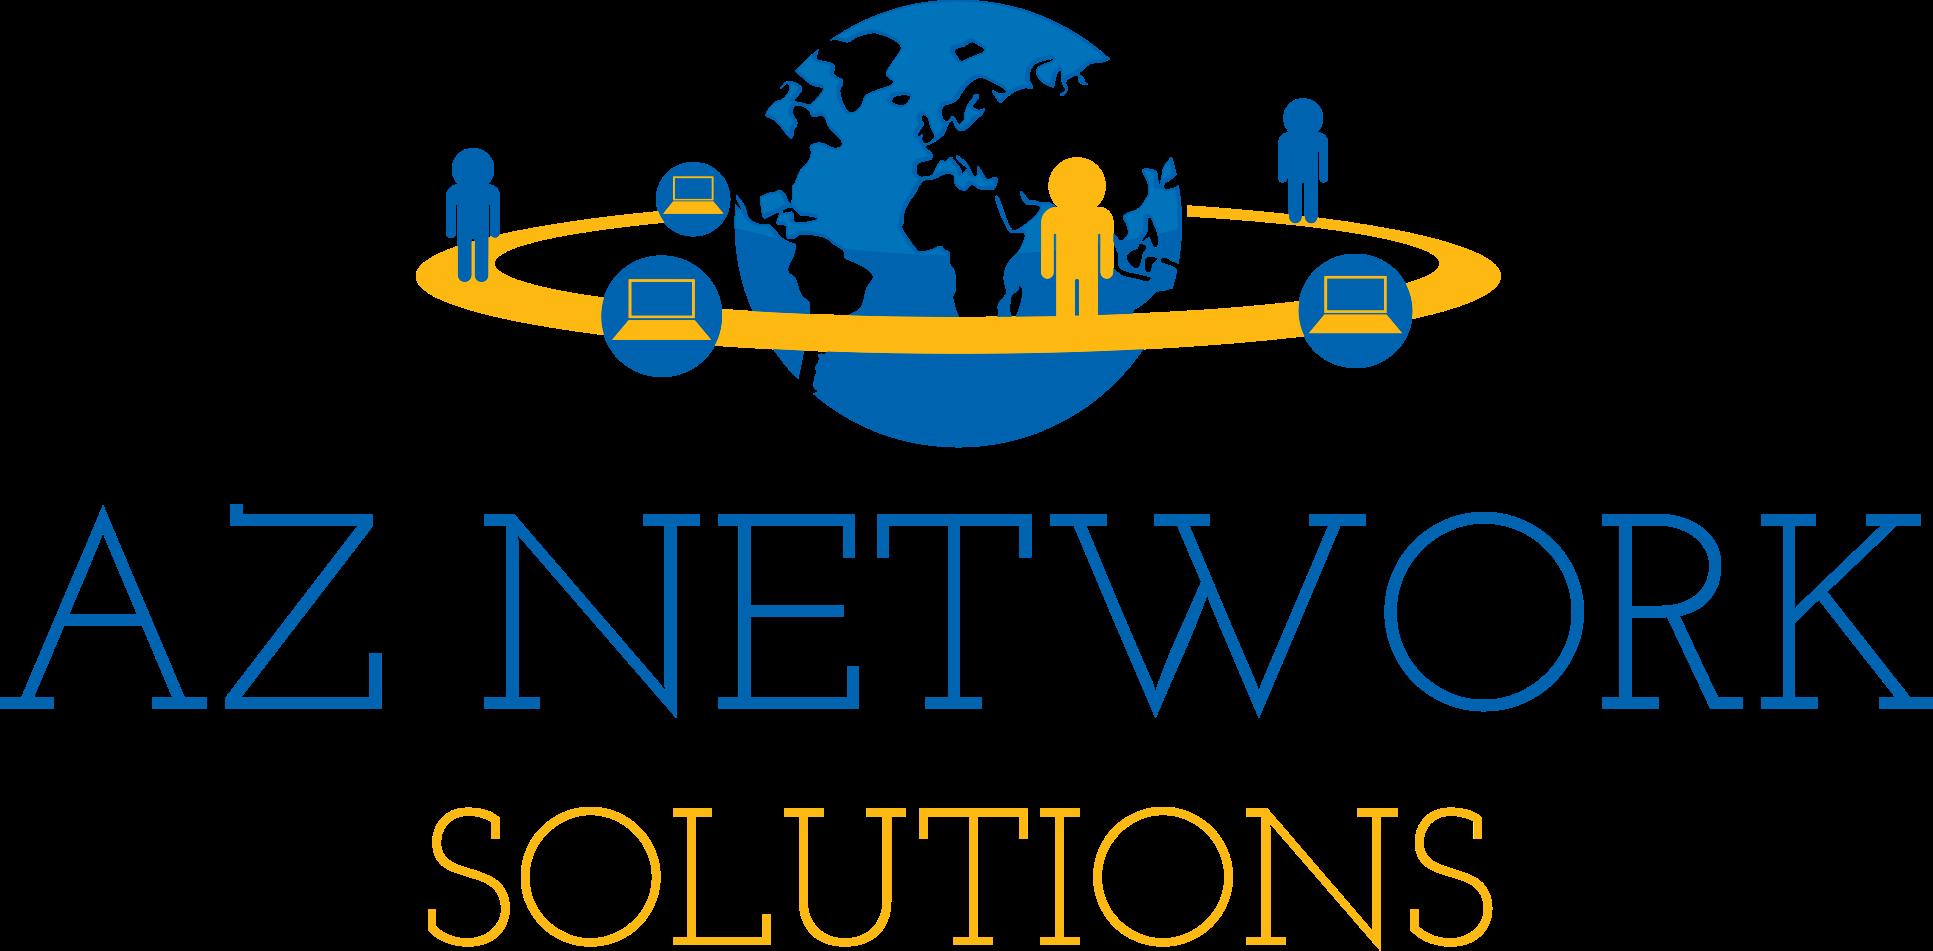 Az Network Solutions